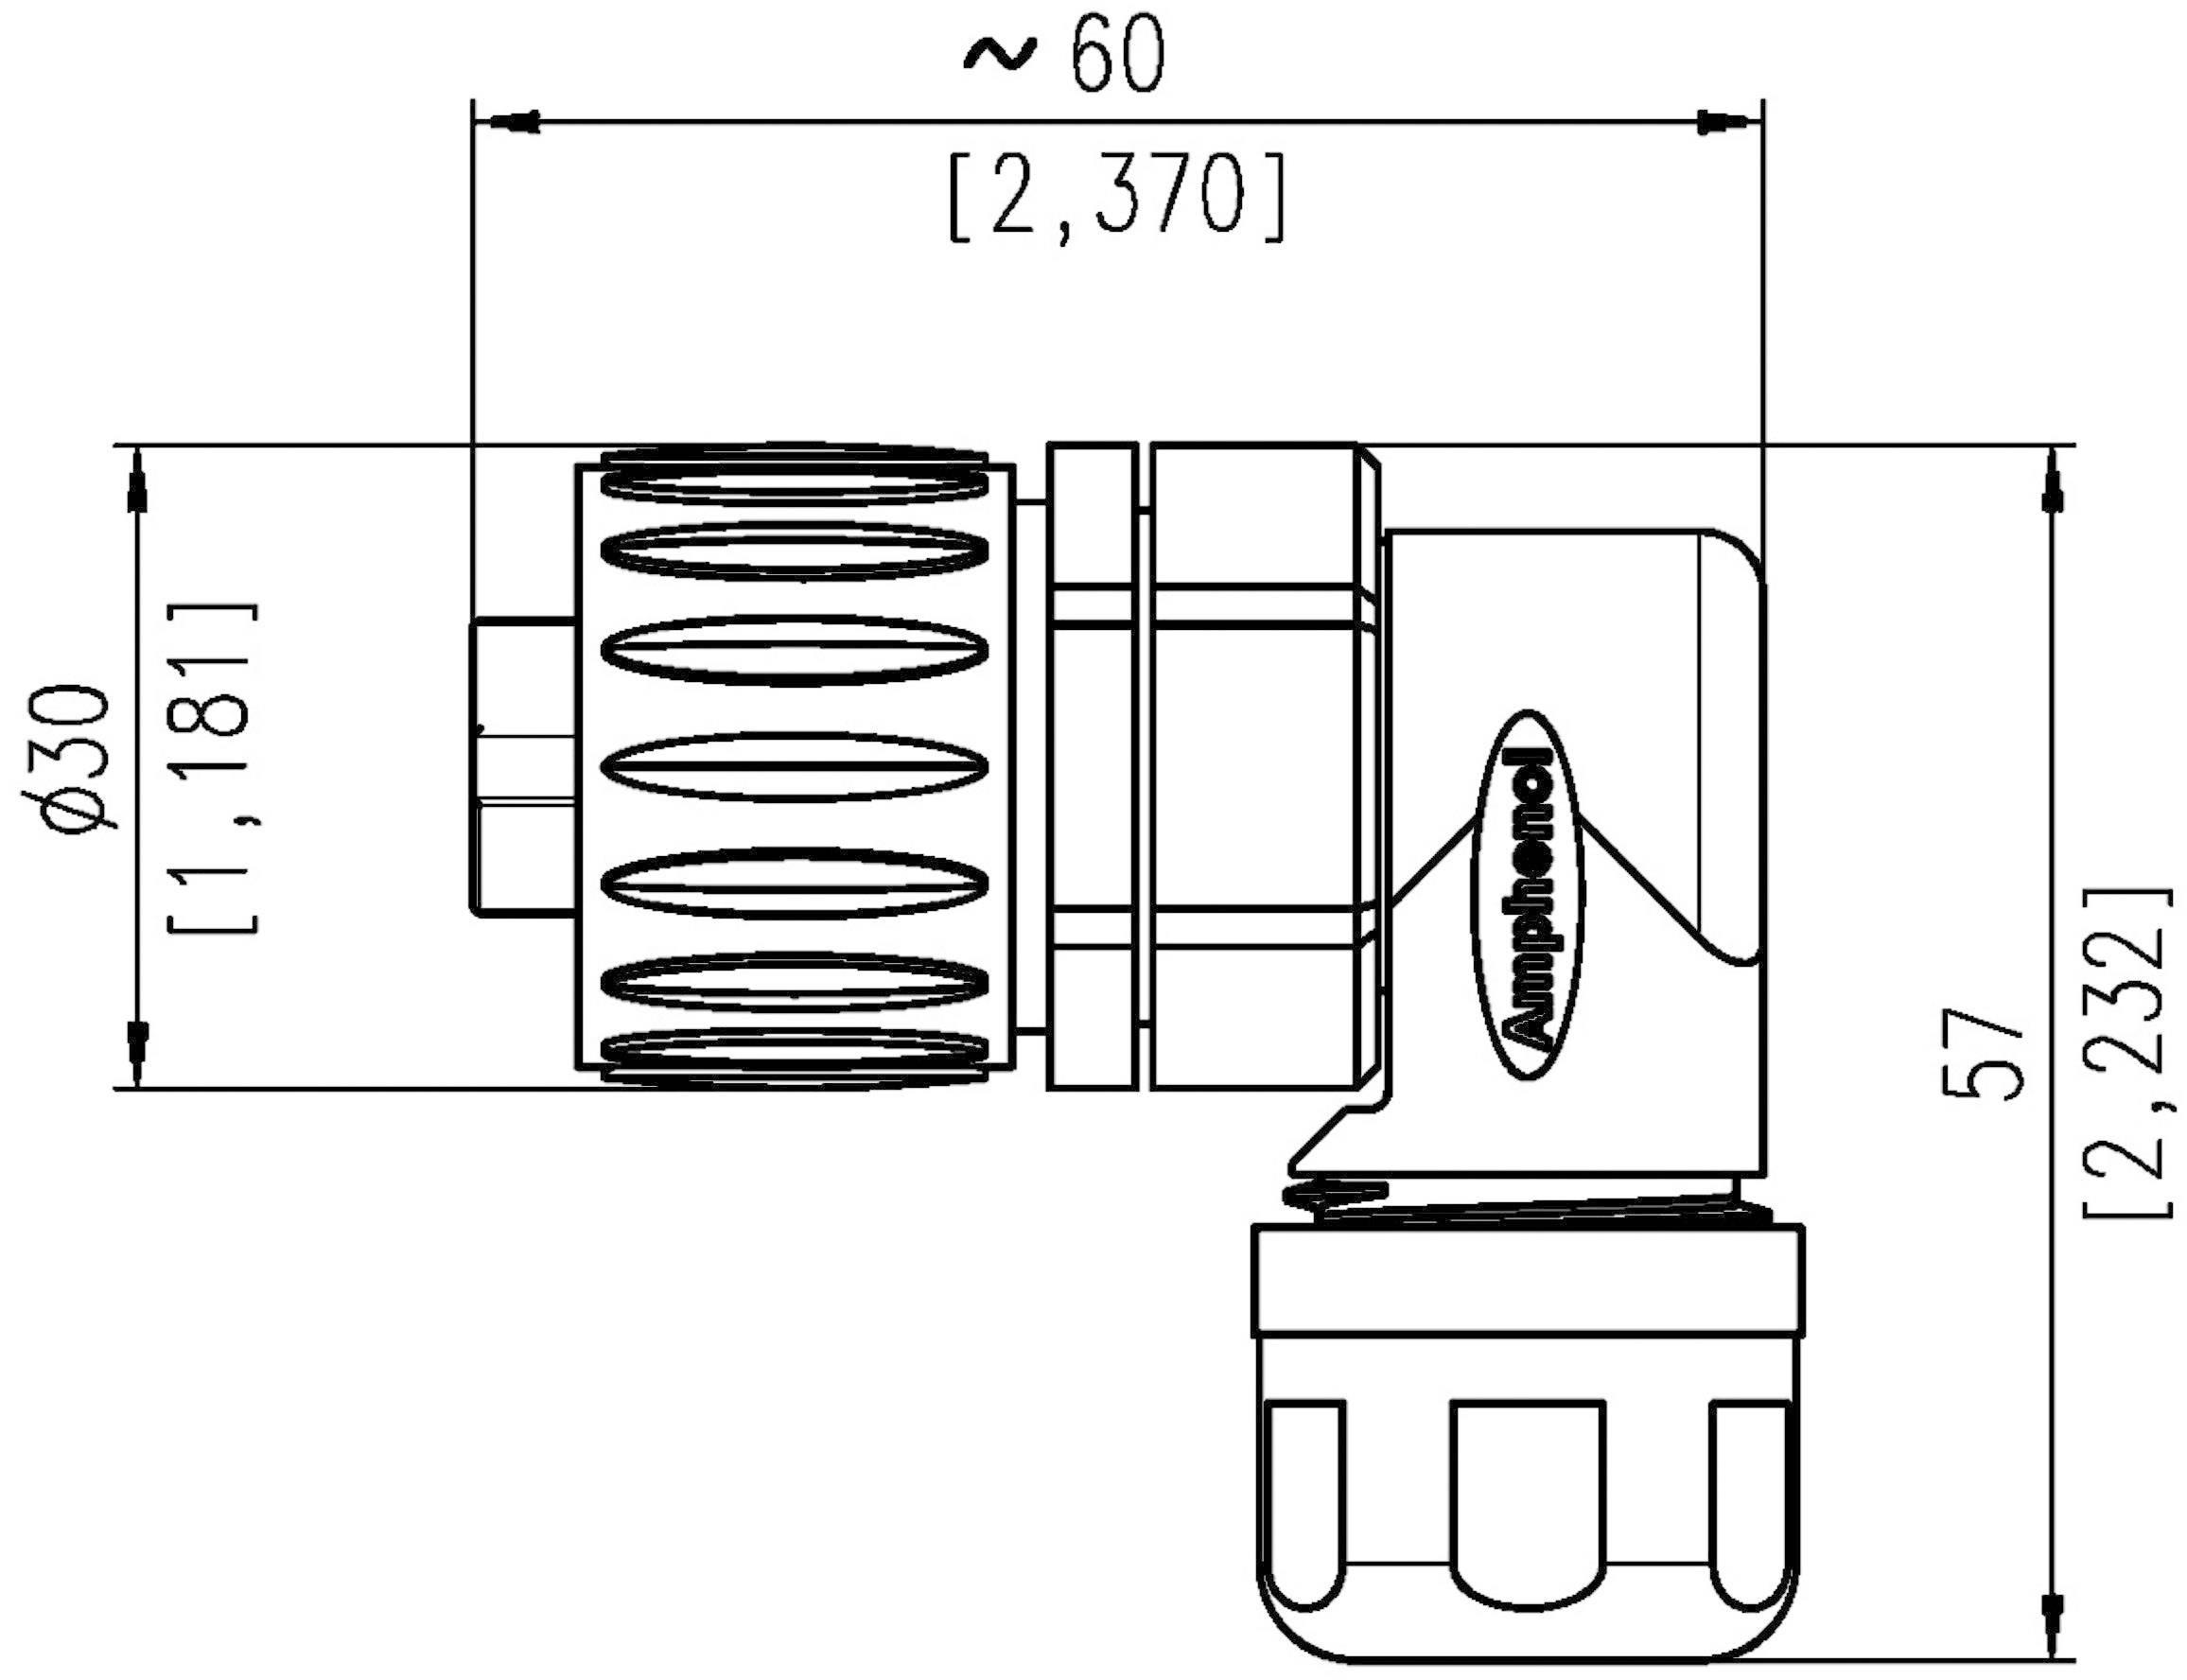 Amphenol C016 30F006 100 10 IP67 (v zablokovanom stave), polyamid 6.6, pólů + PE, 1 ks